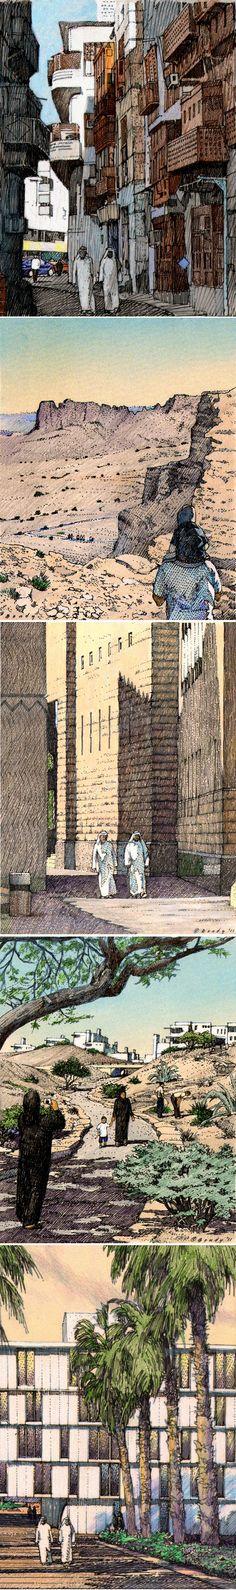 SOM, Chicago.  KA-CARE, Saudi Arabia. Storyboard images rendered by Bruce Bondy, Bondy Studio